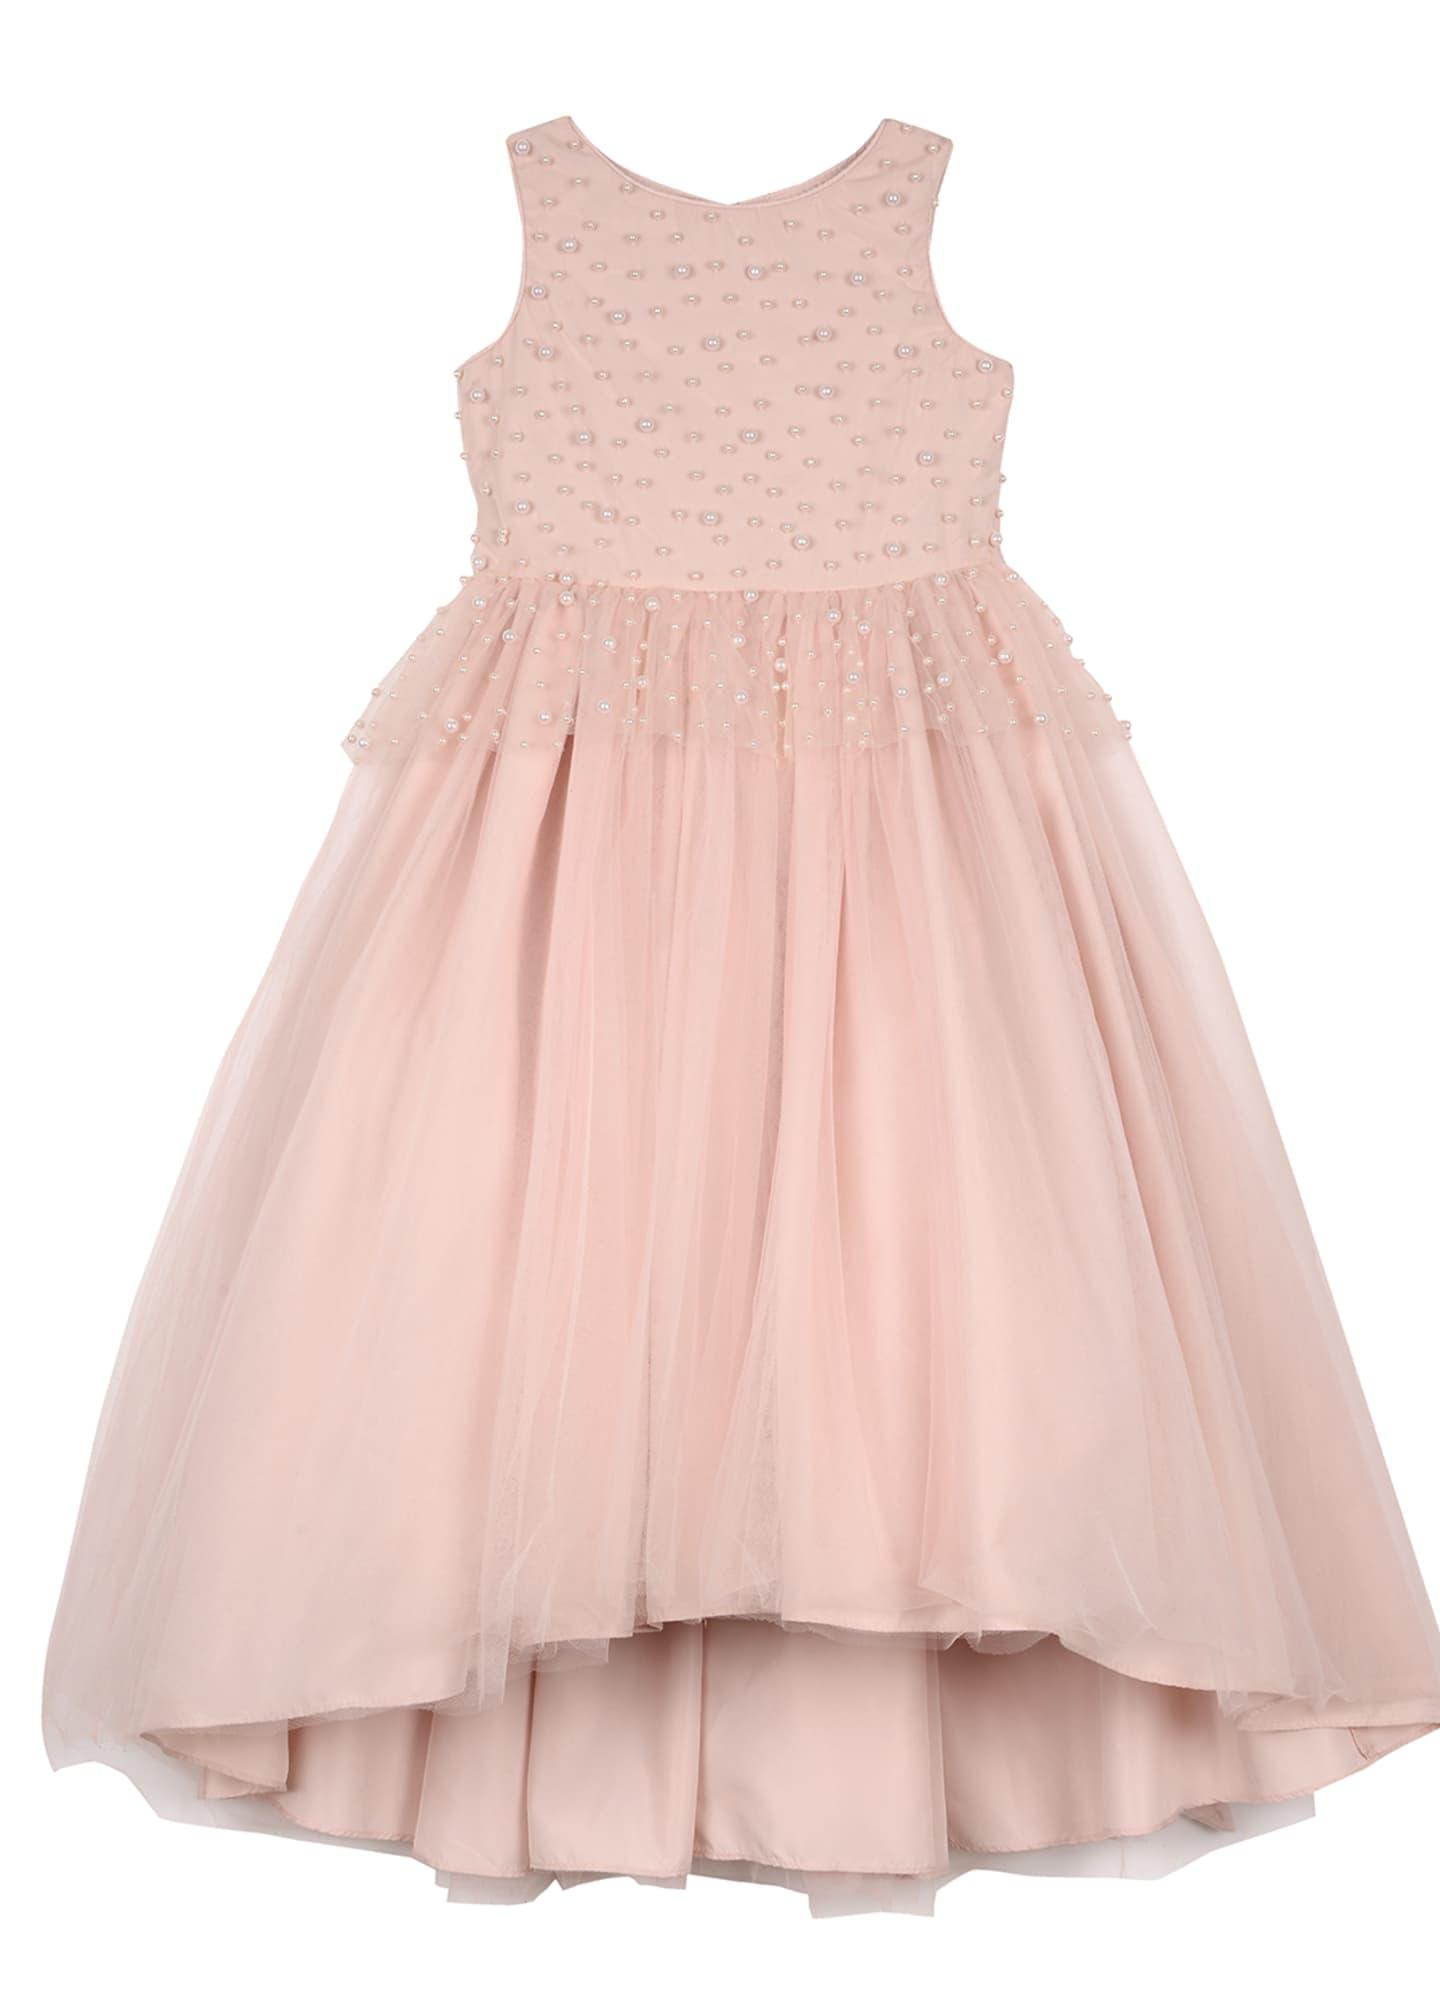 Badgley Mischka Kid's Peplum High-Low Maxi Dress w/